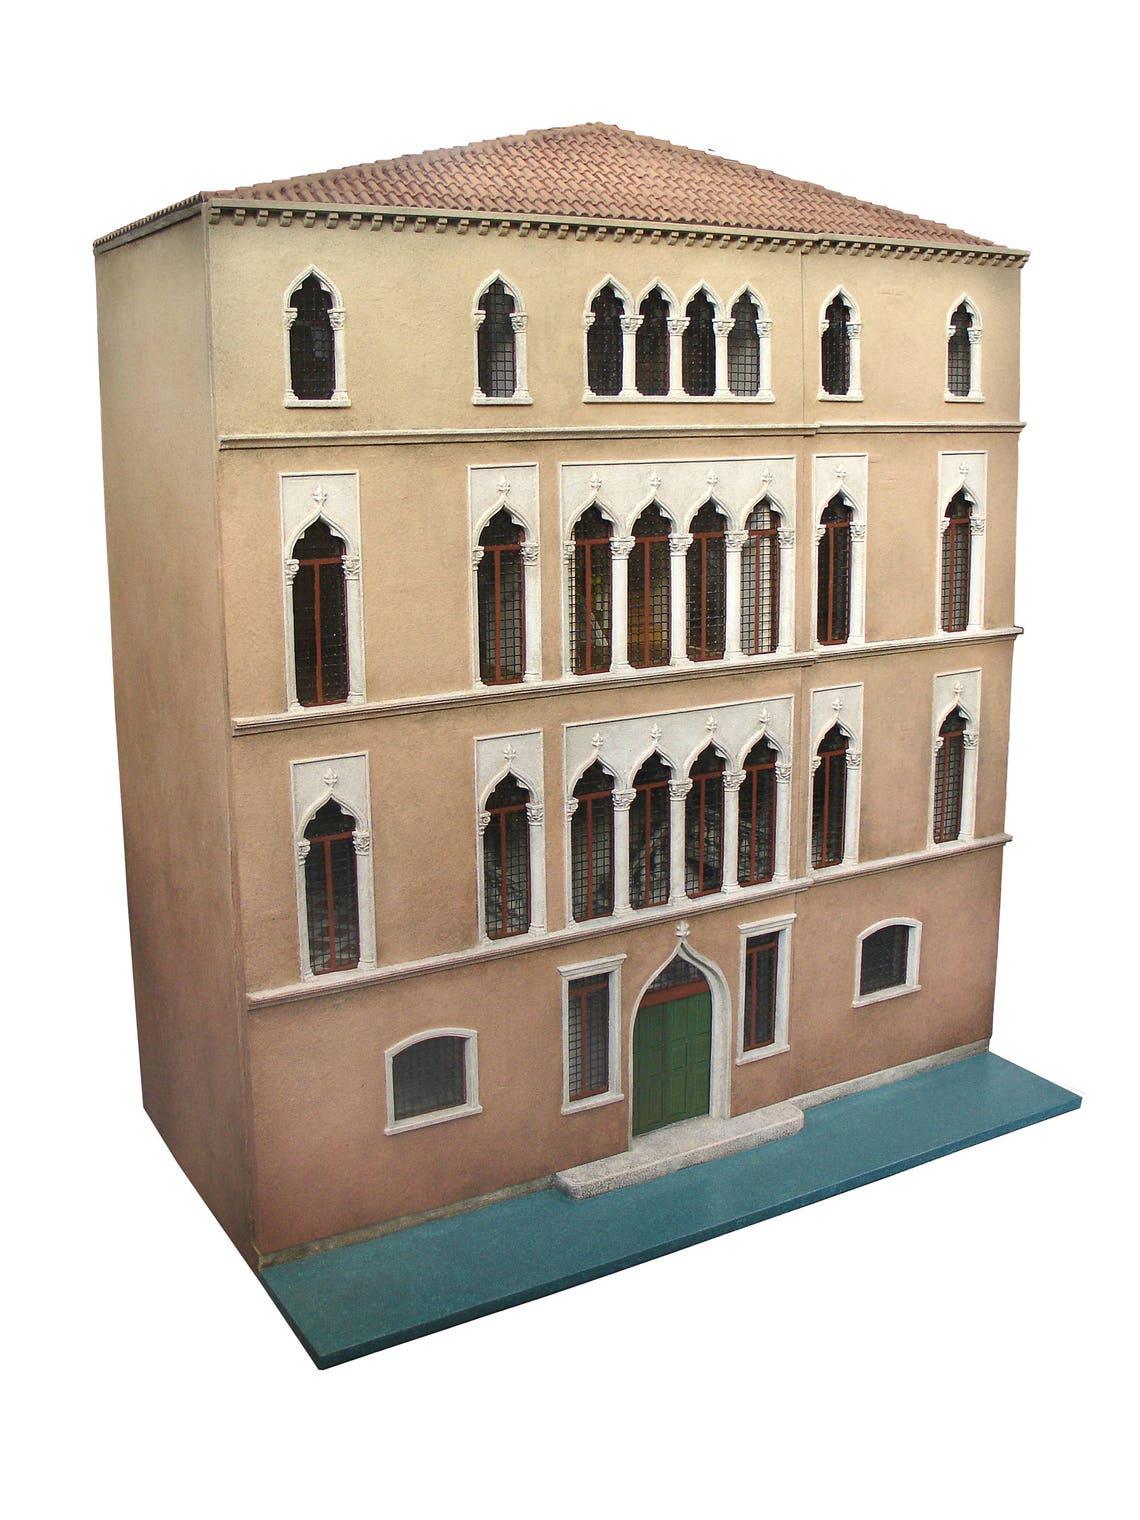 Venetian Palazzo Miniature dolls house 1/12th scale image 0